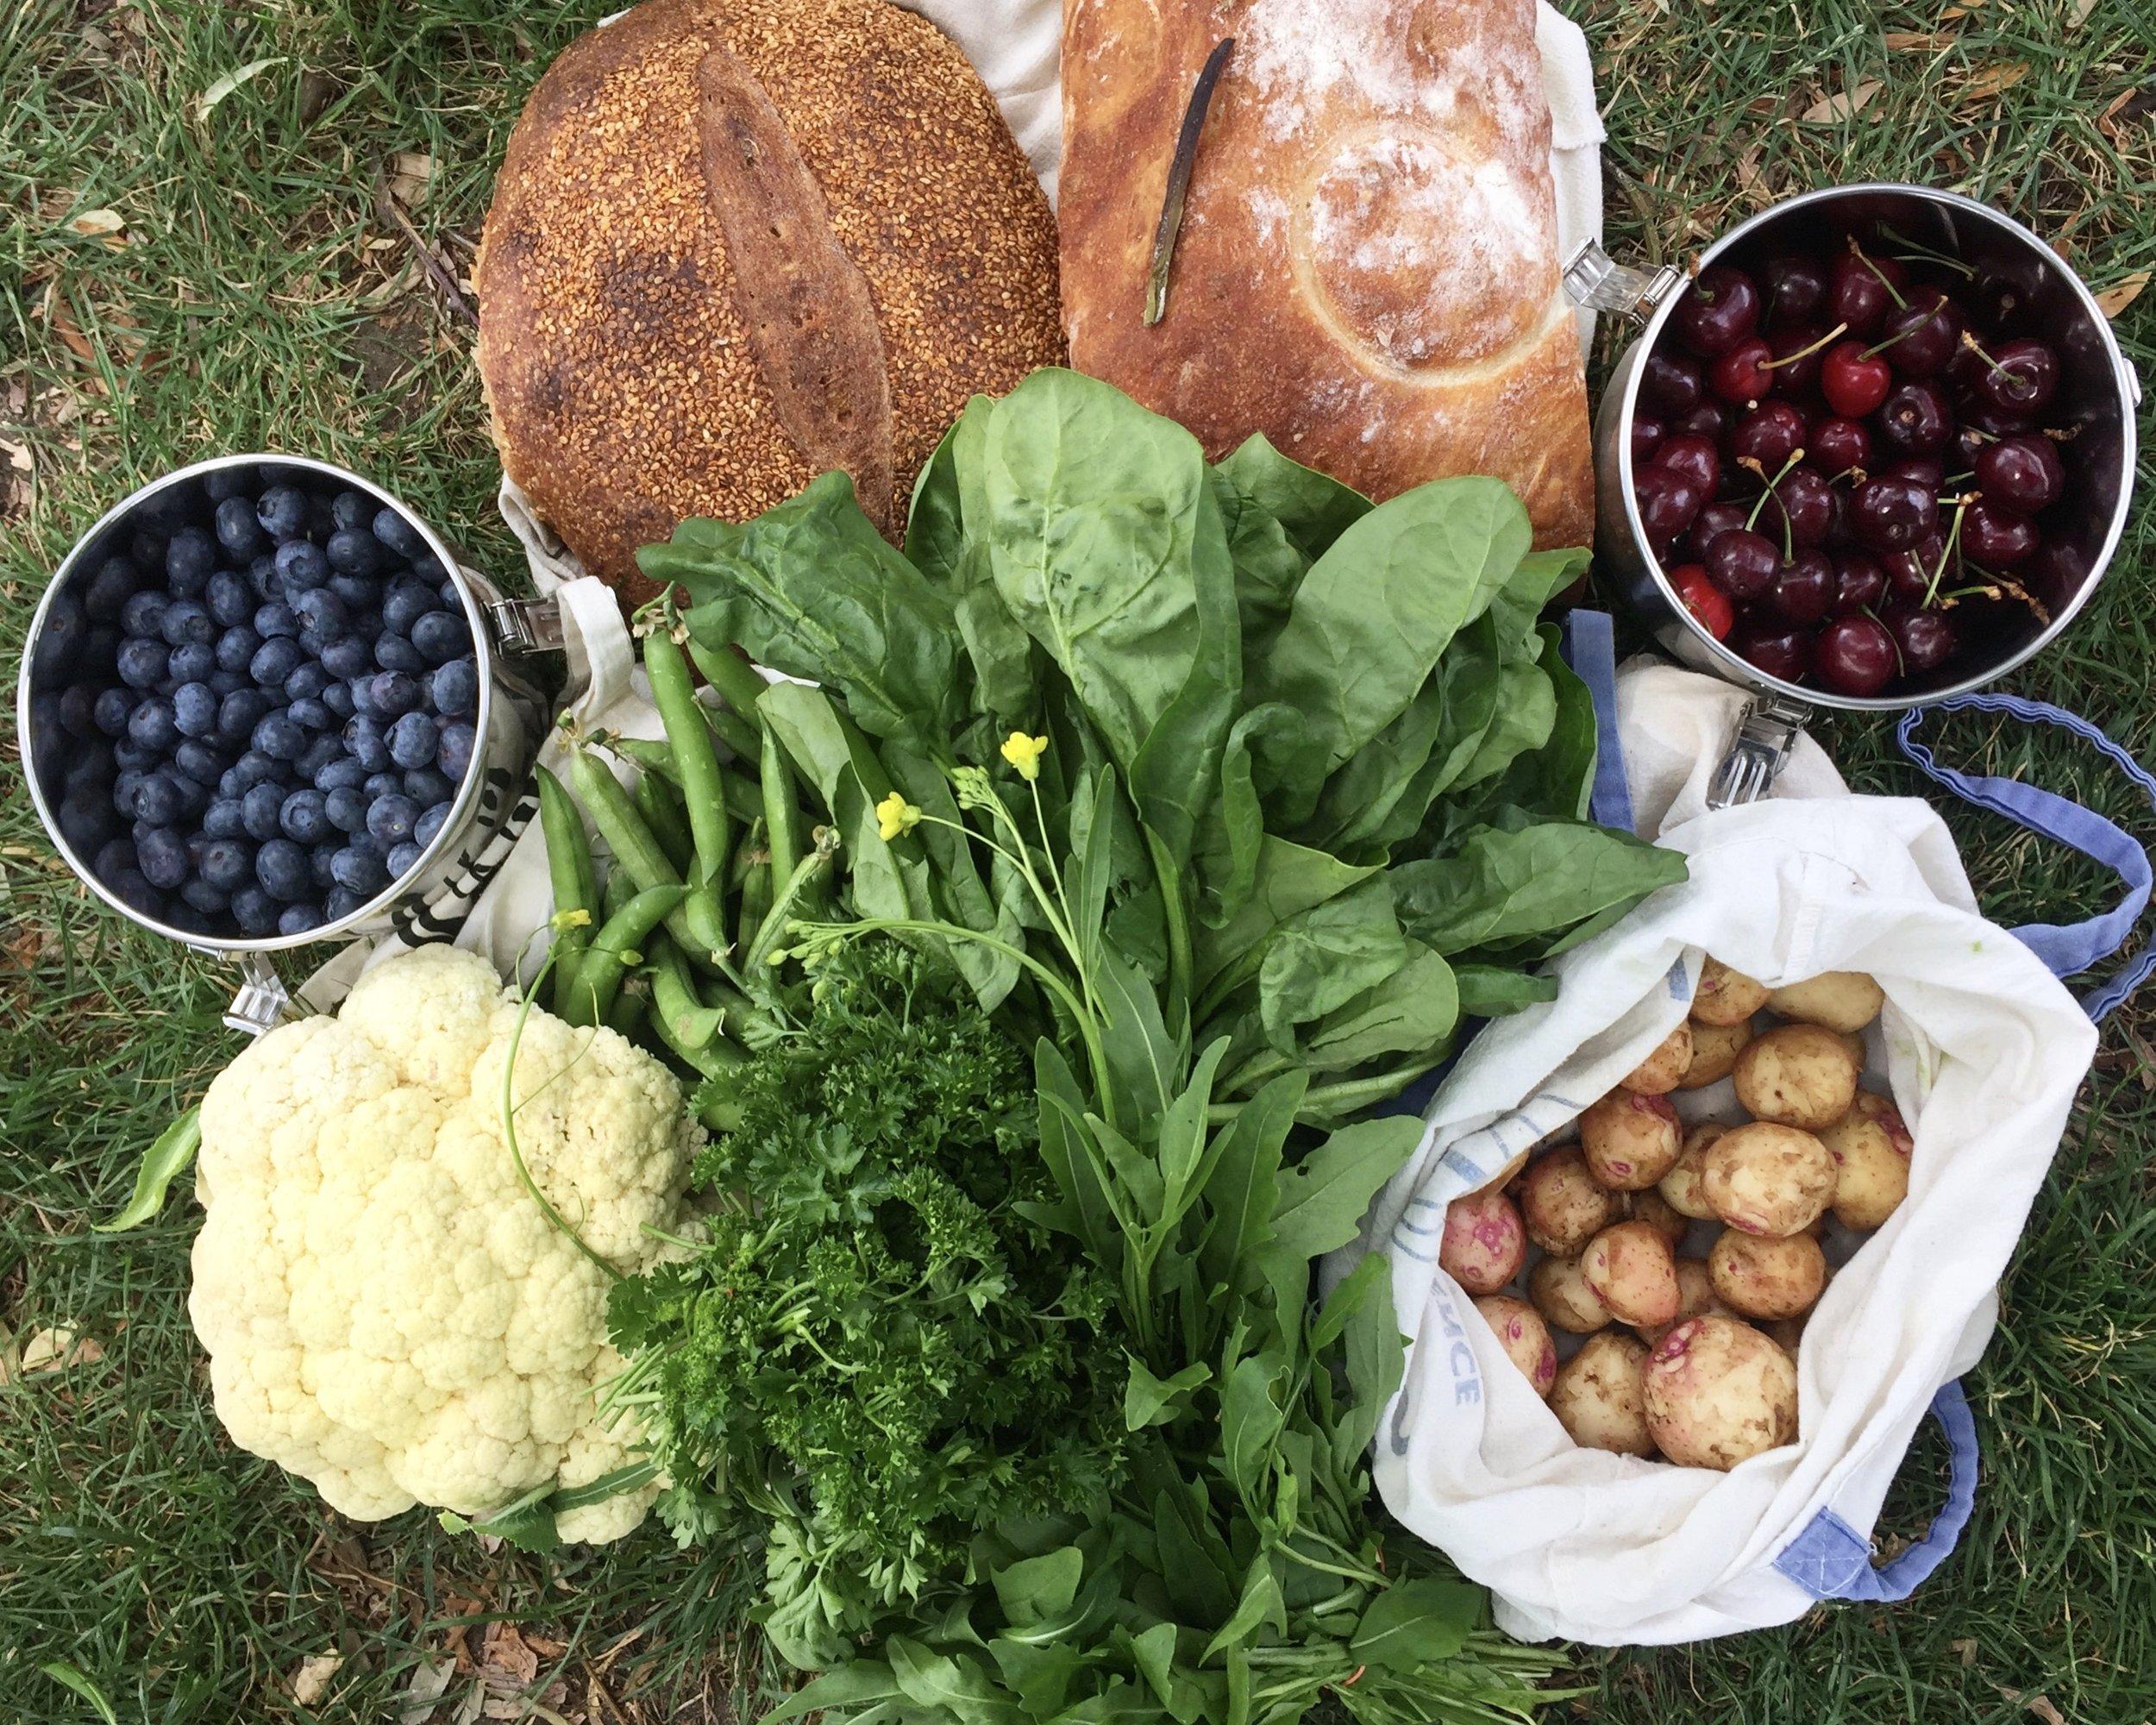 A Trout Lake farmers market haul: blueberries, two loaves of sourdough, cherries, new potatoes, spinach, arugula, parsley, cauliflower, English peas